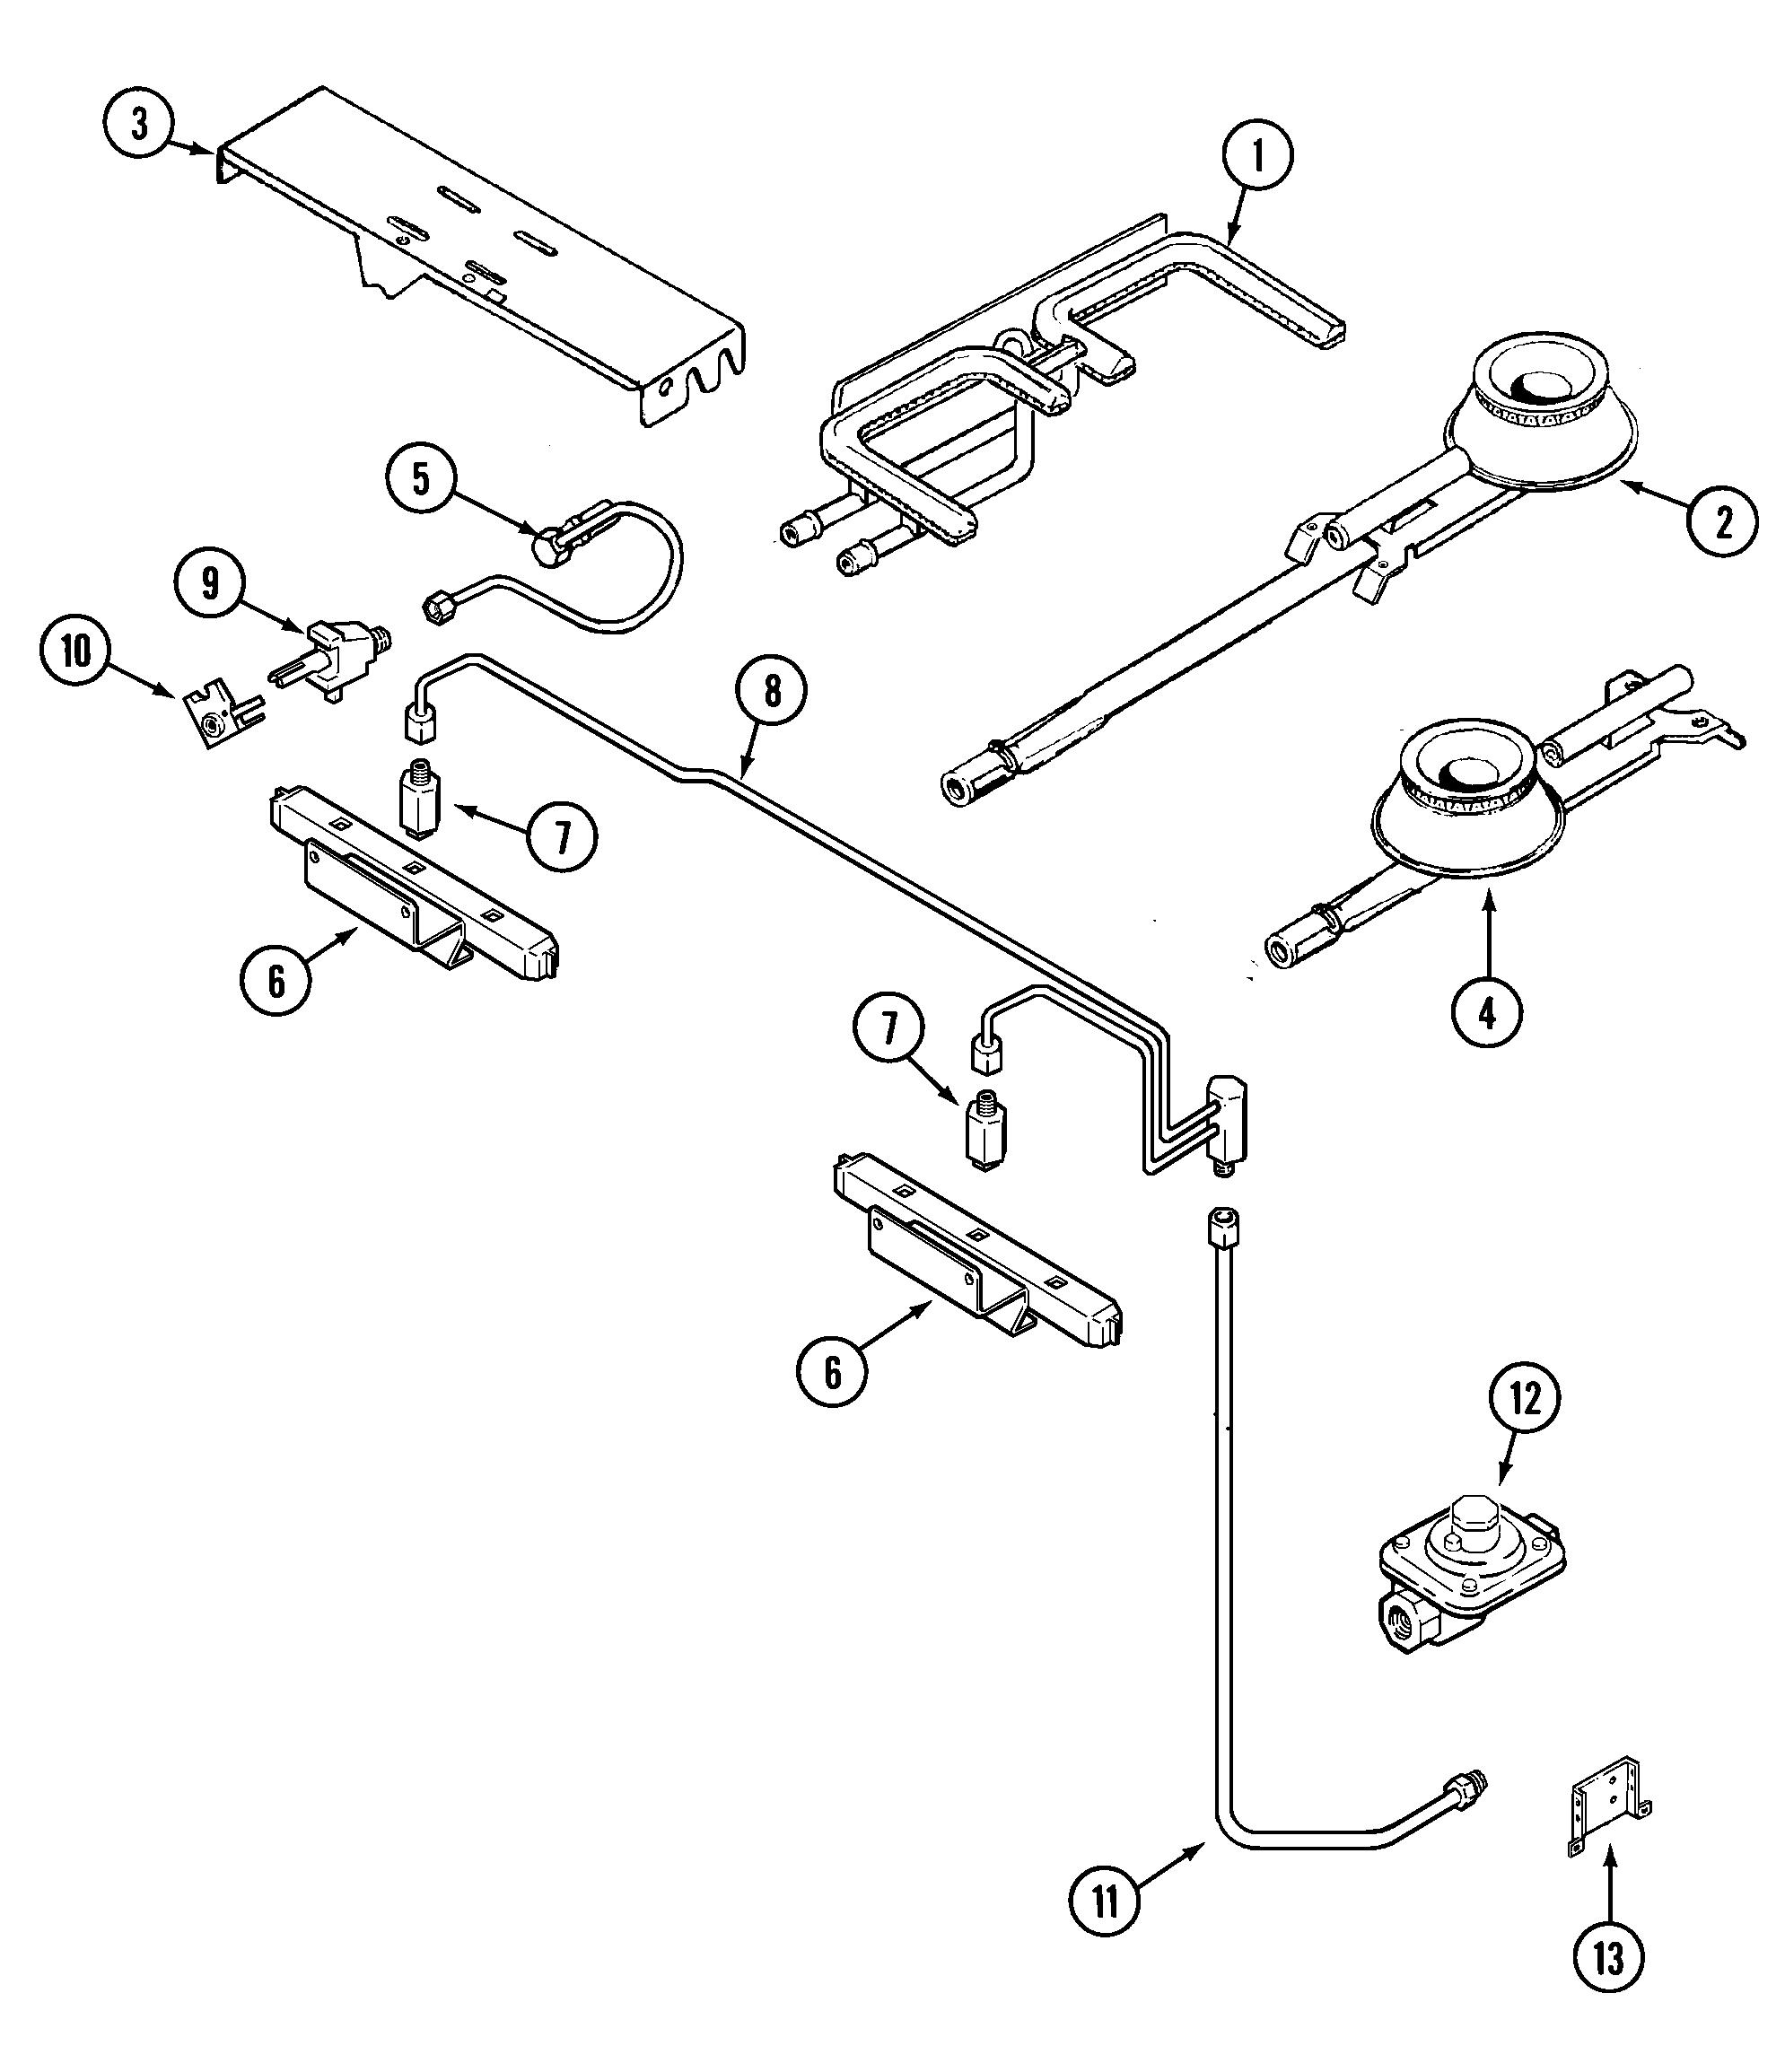 Gas Valve Electrical Schematic